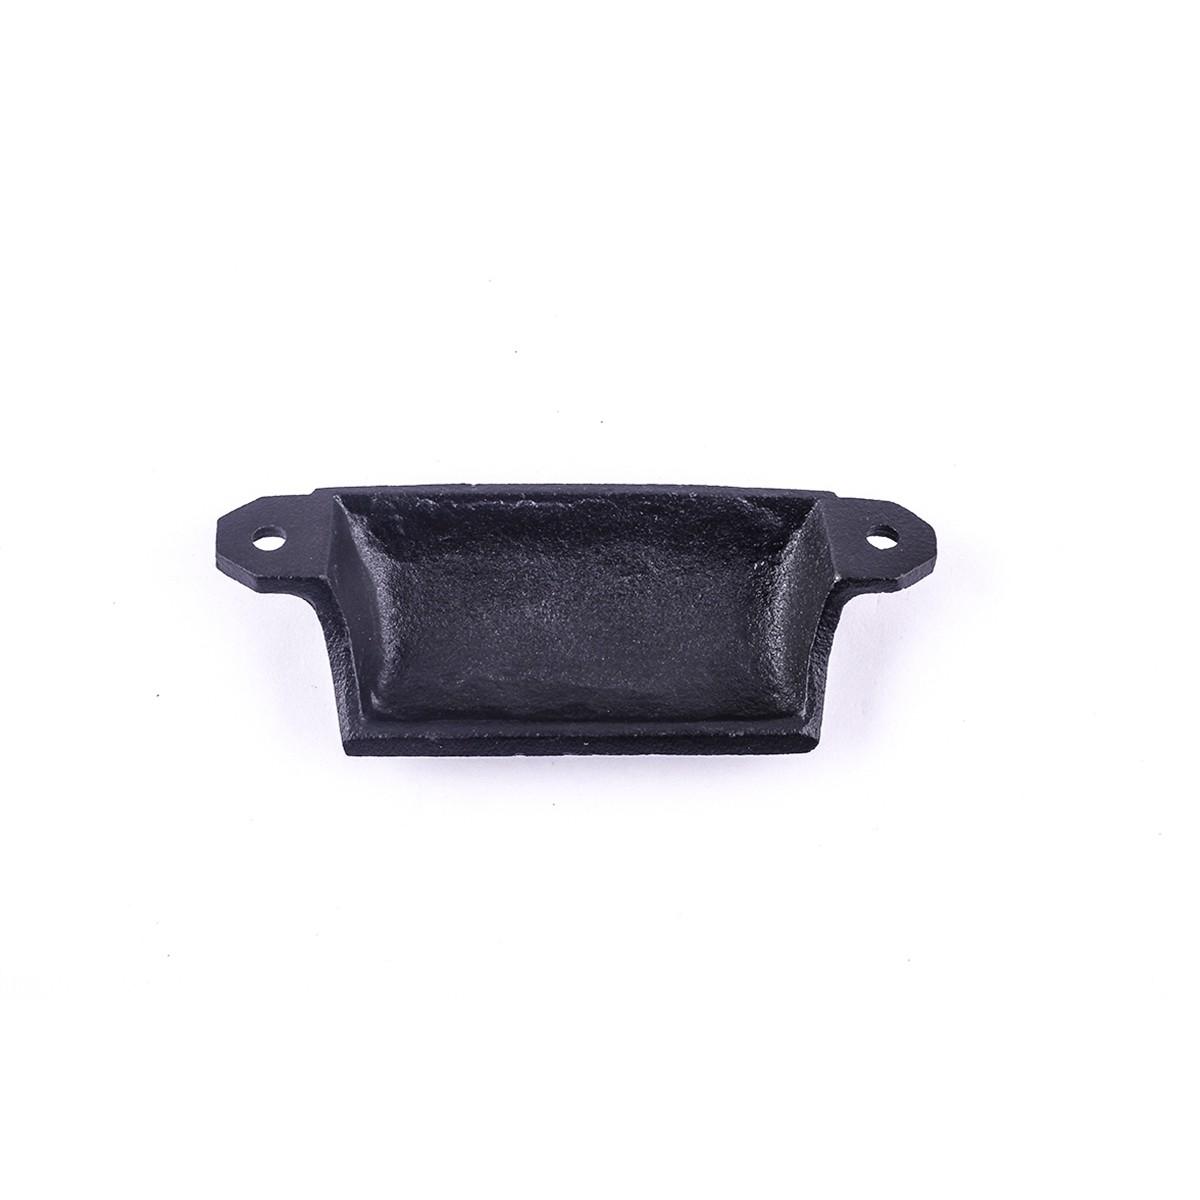 Cabinet or Drawer Bin Pull Black Iron Cup 4 W x 1 12 H Bin Pulls Black Wrought Iron Bin Pull Cabinet Door Bin Pull